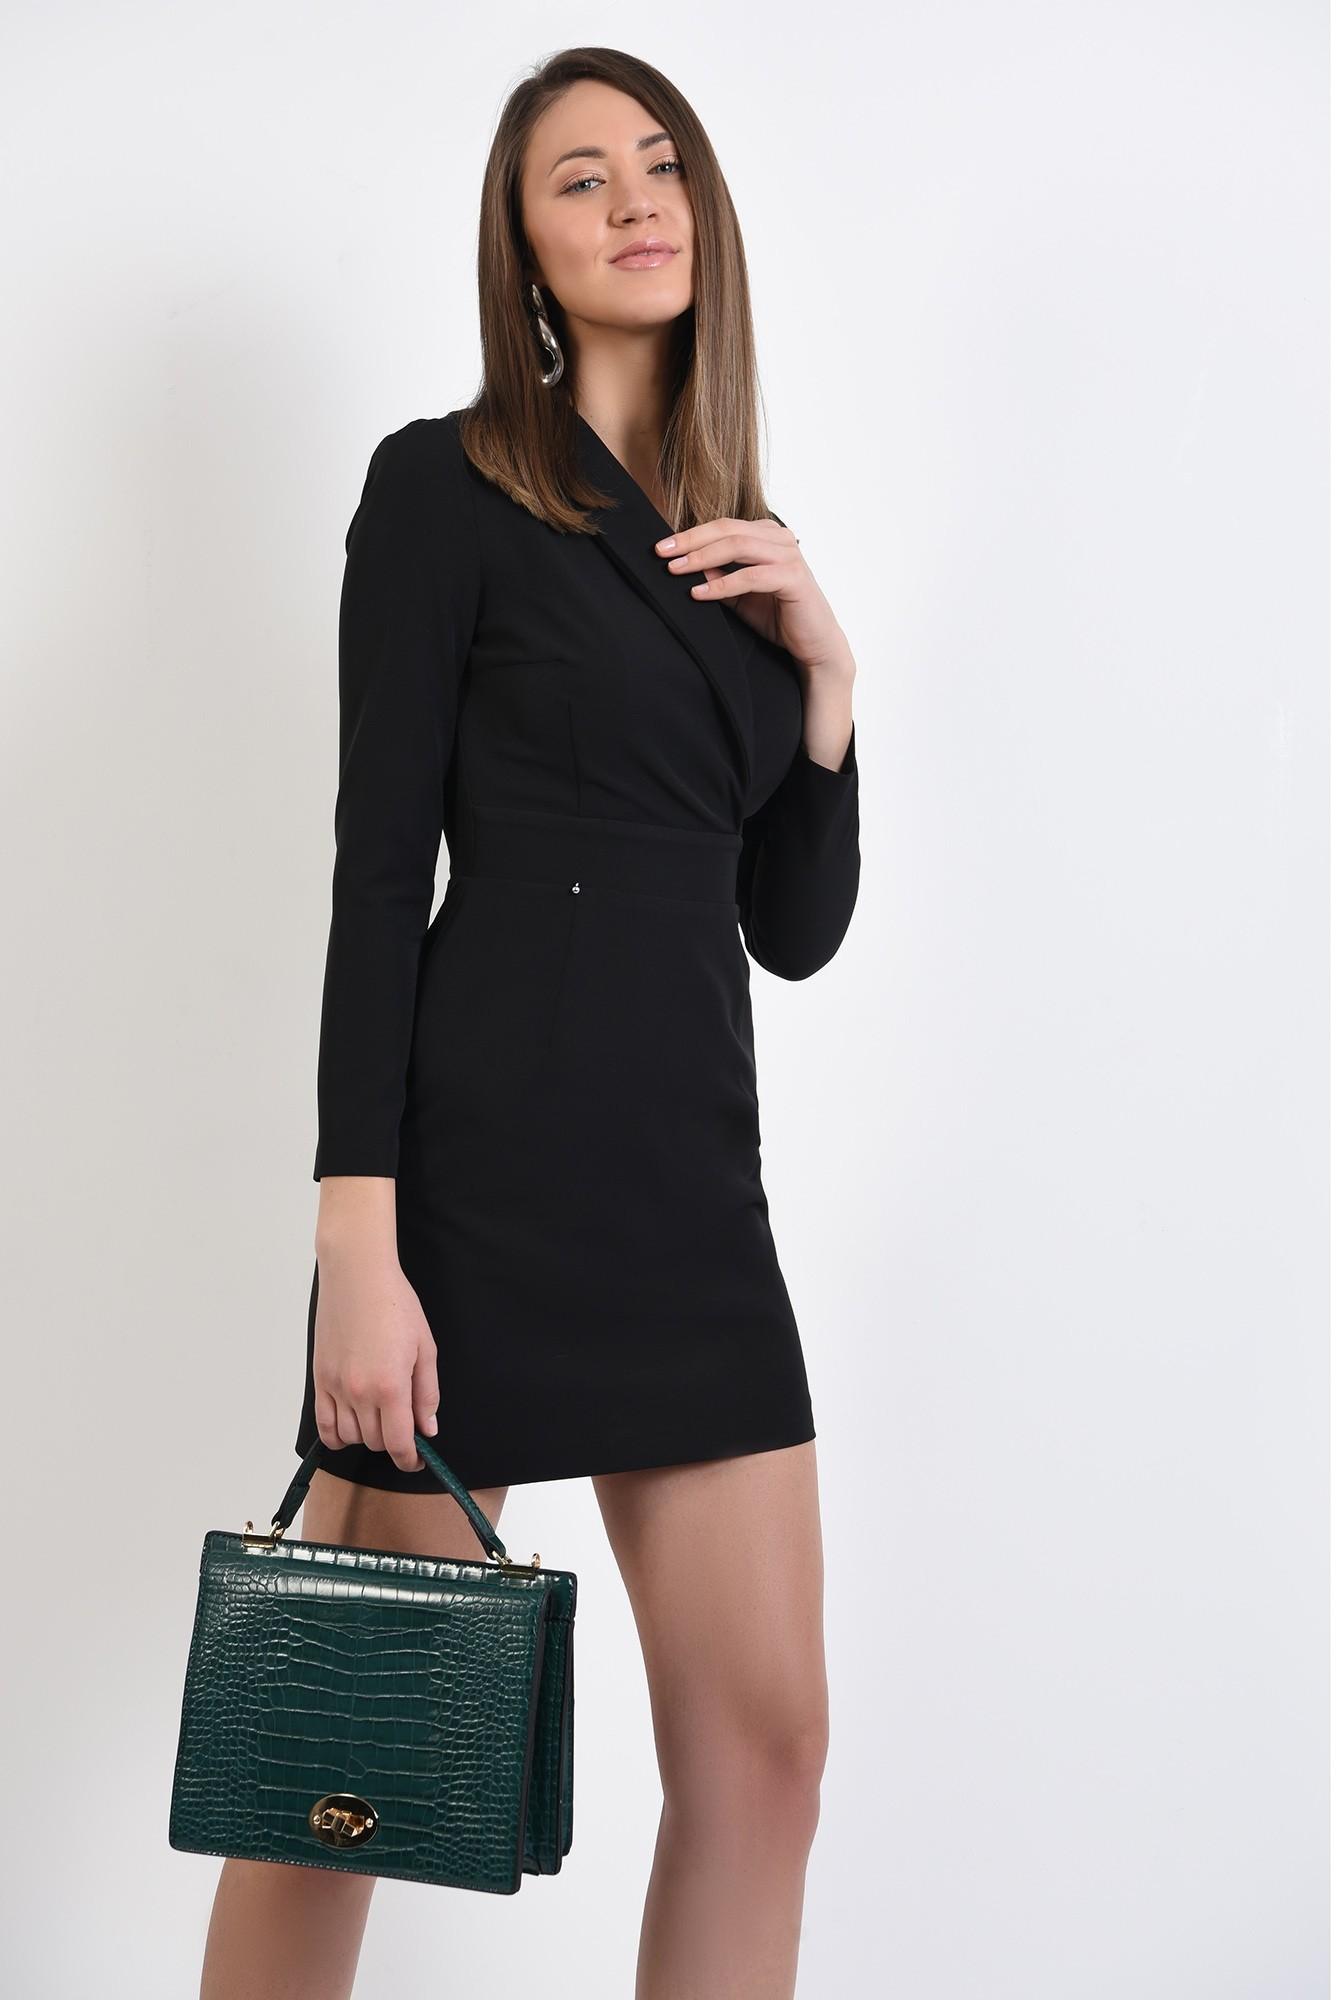 0 - rochie mini, neagra, cu revere, scurta, maneci ajustate, Poema